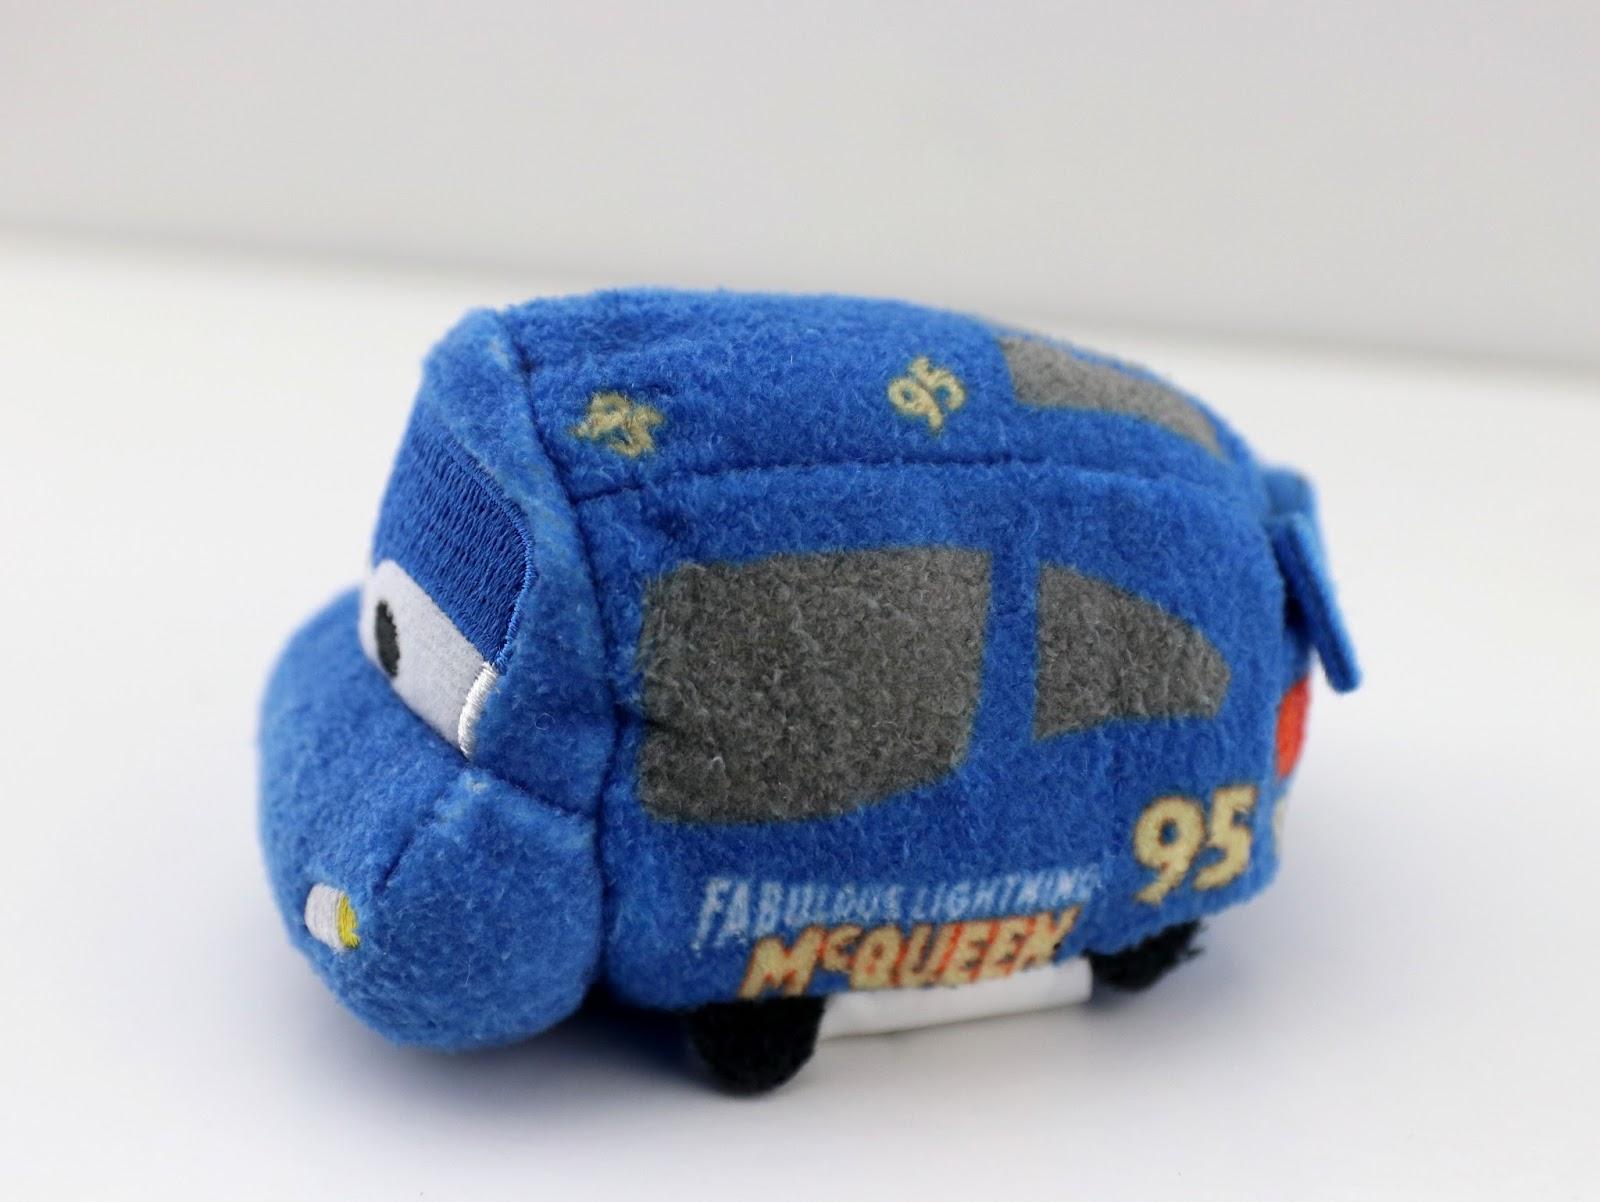 Cars 3 Fabulous Lightning McQueen & Dinoco Cruz Ramirez Tsum Tsum 2-Pack set